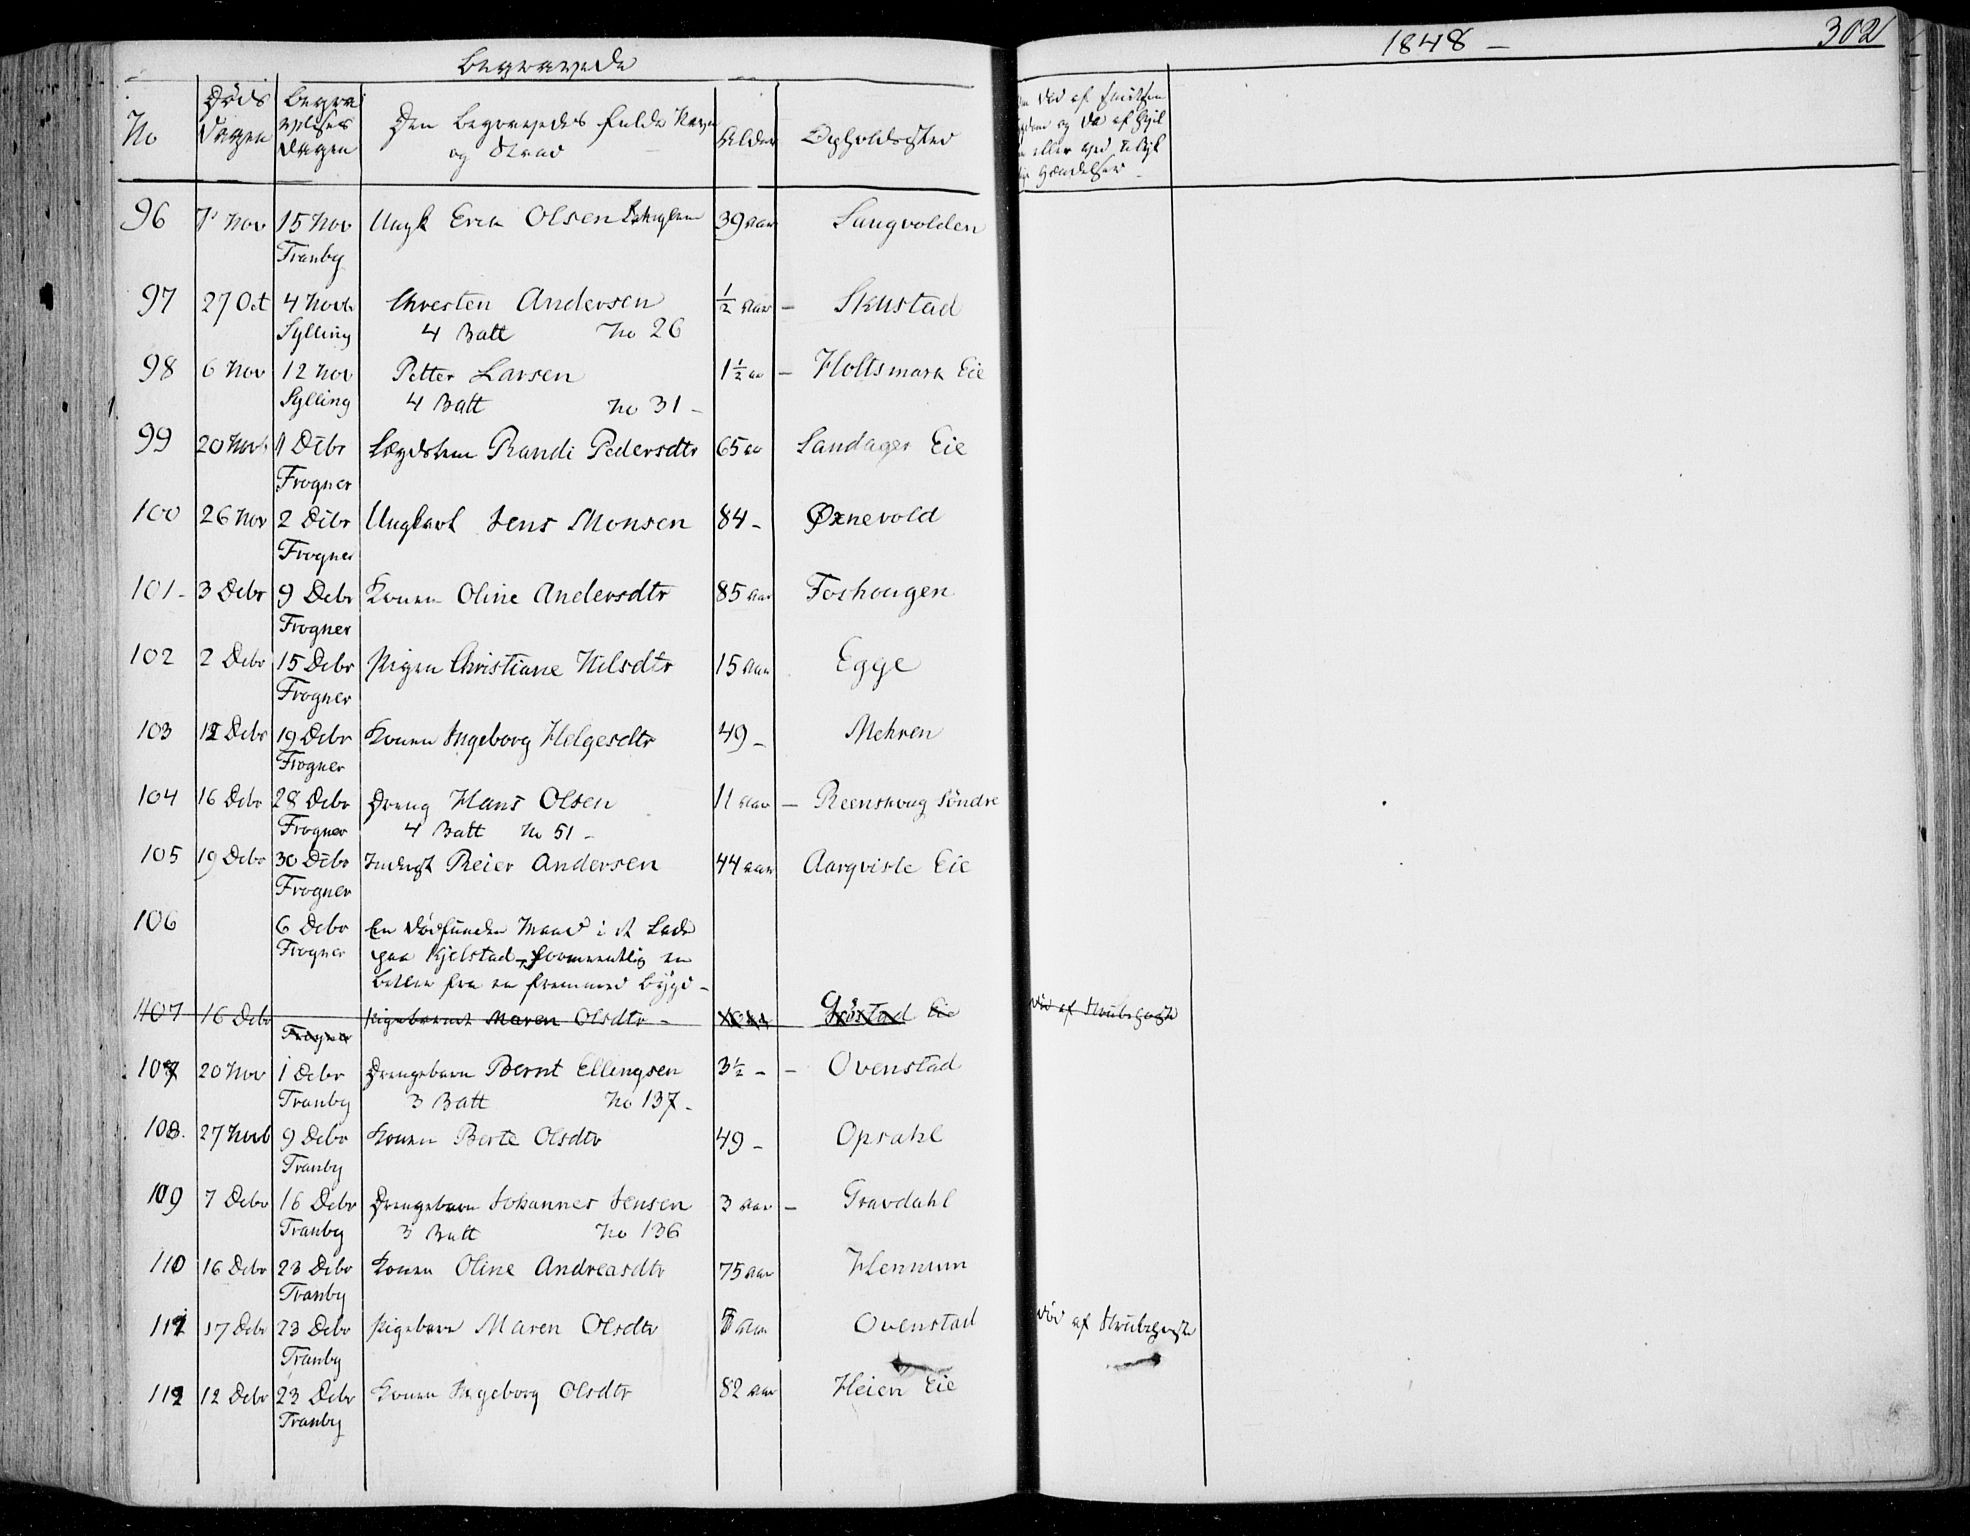 SAKO, Lier kirkebøker, F/Fa/L0011: Ministerialbok nr. I 11, 1843-1854, s. 302